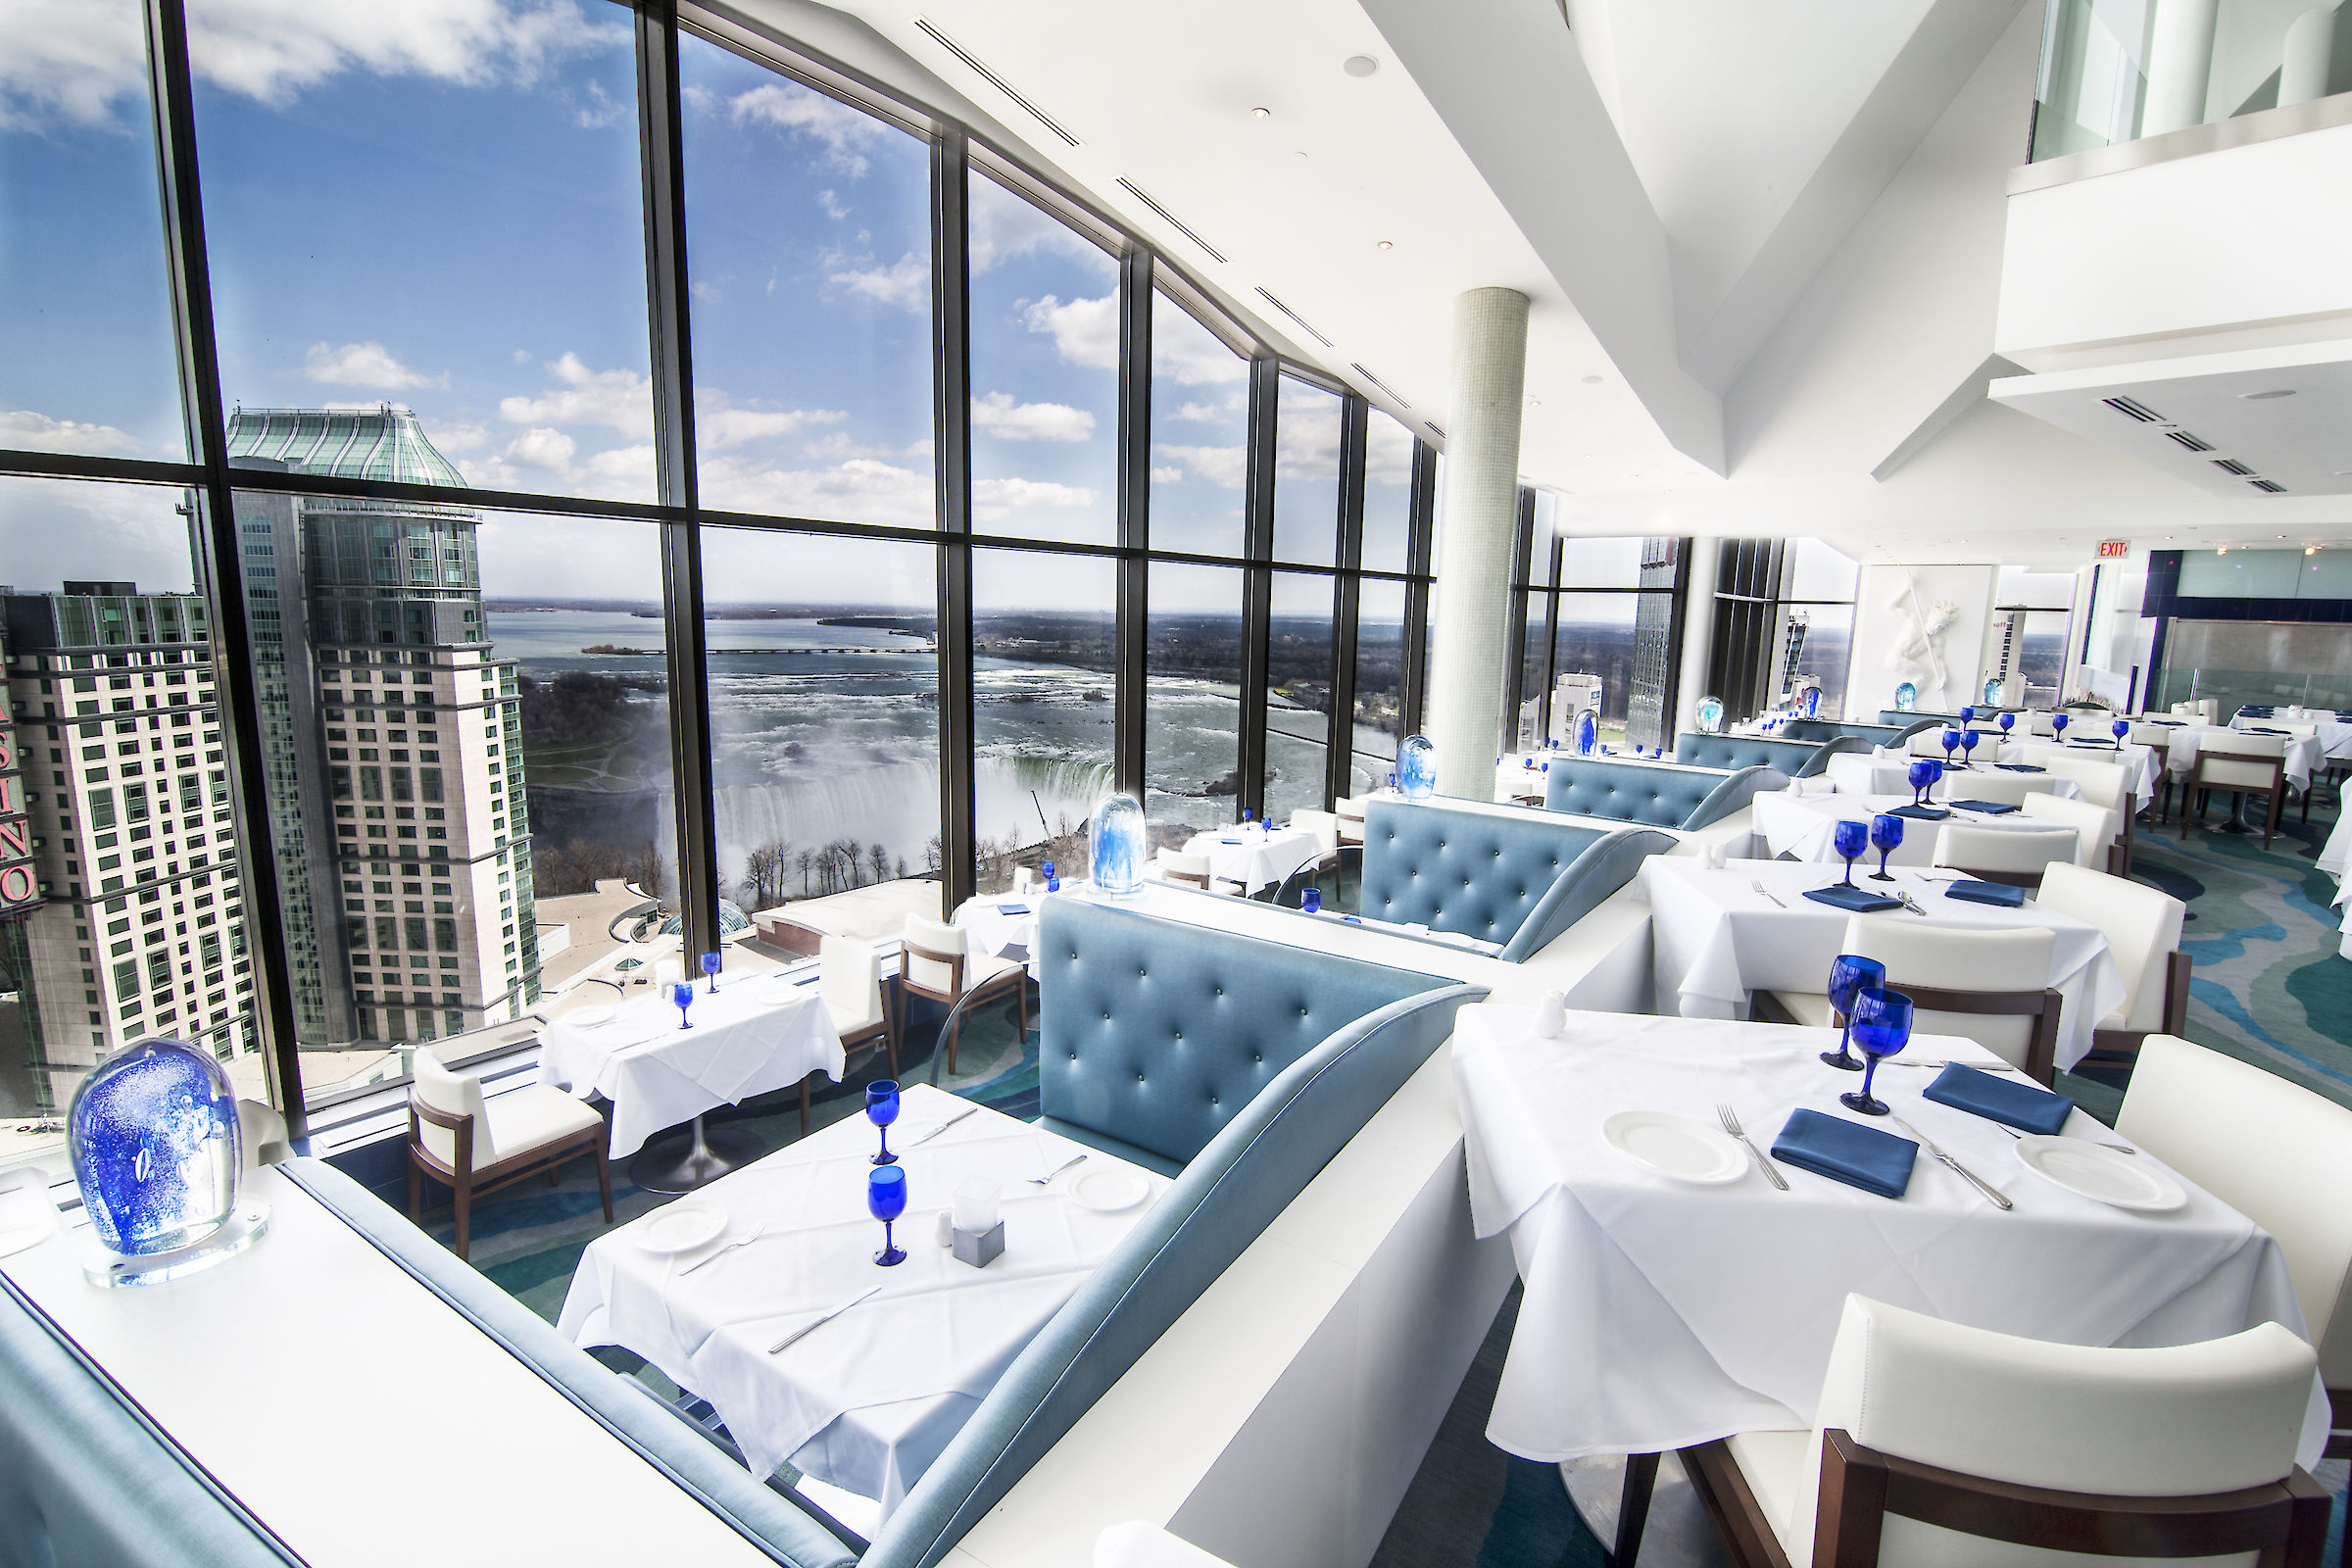 Hilton Hotel And Suites Niagara Falls Fallsview Where